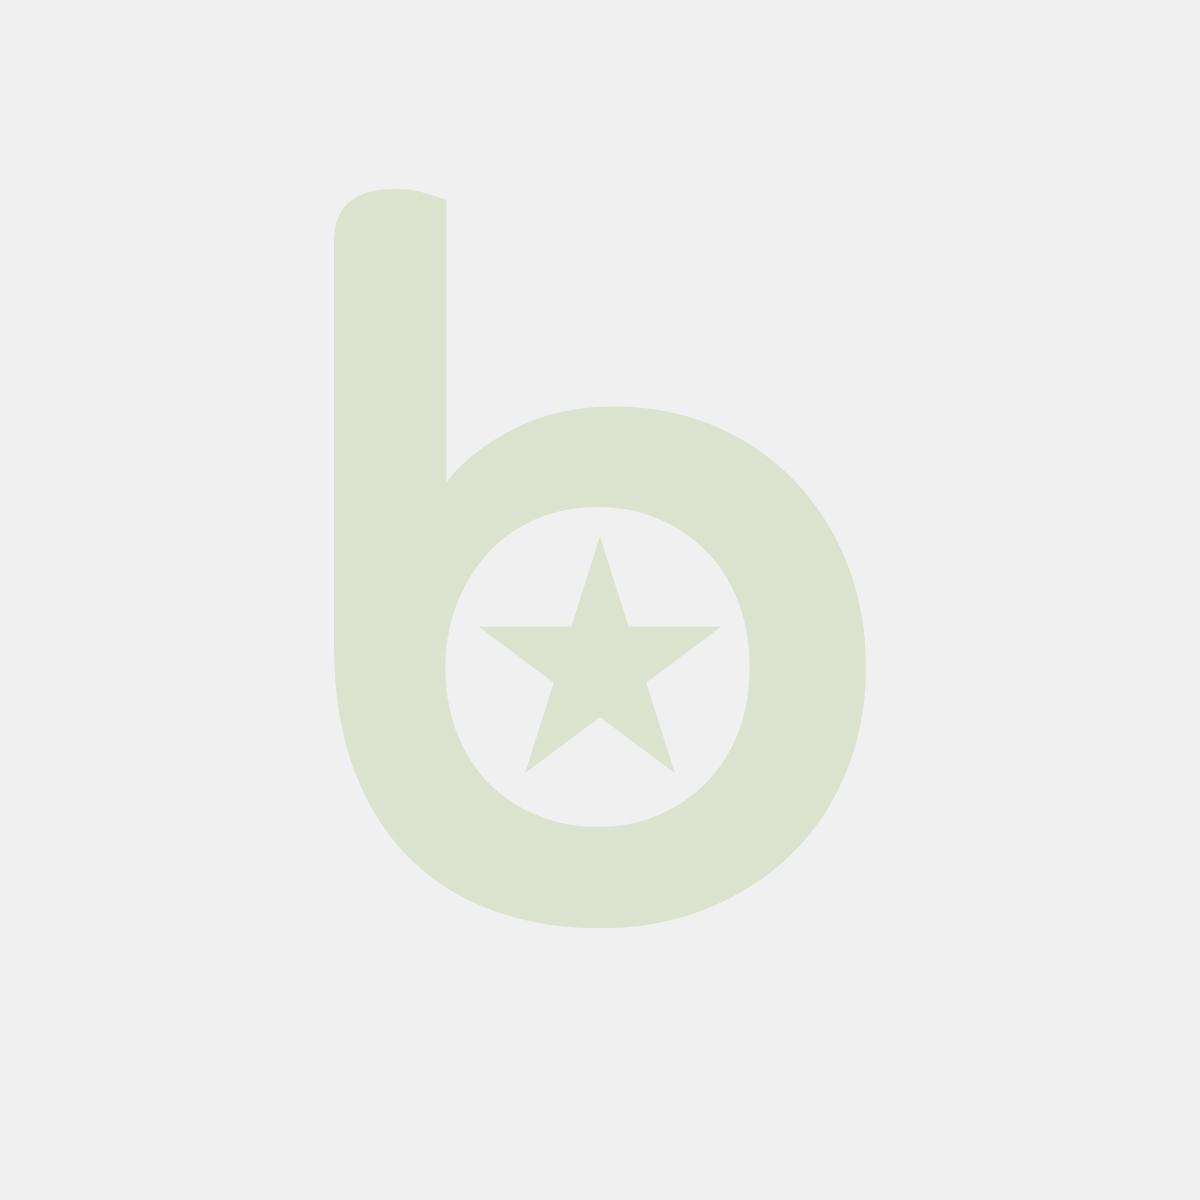 FINGERFOOD - pucharek 95ml PS transparentny 5,7x5,8x5,7 op. 25 sztuk